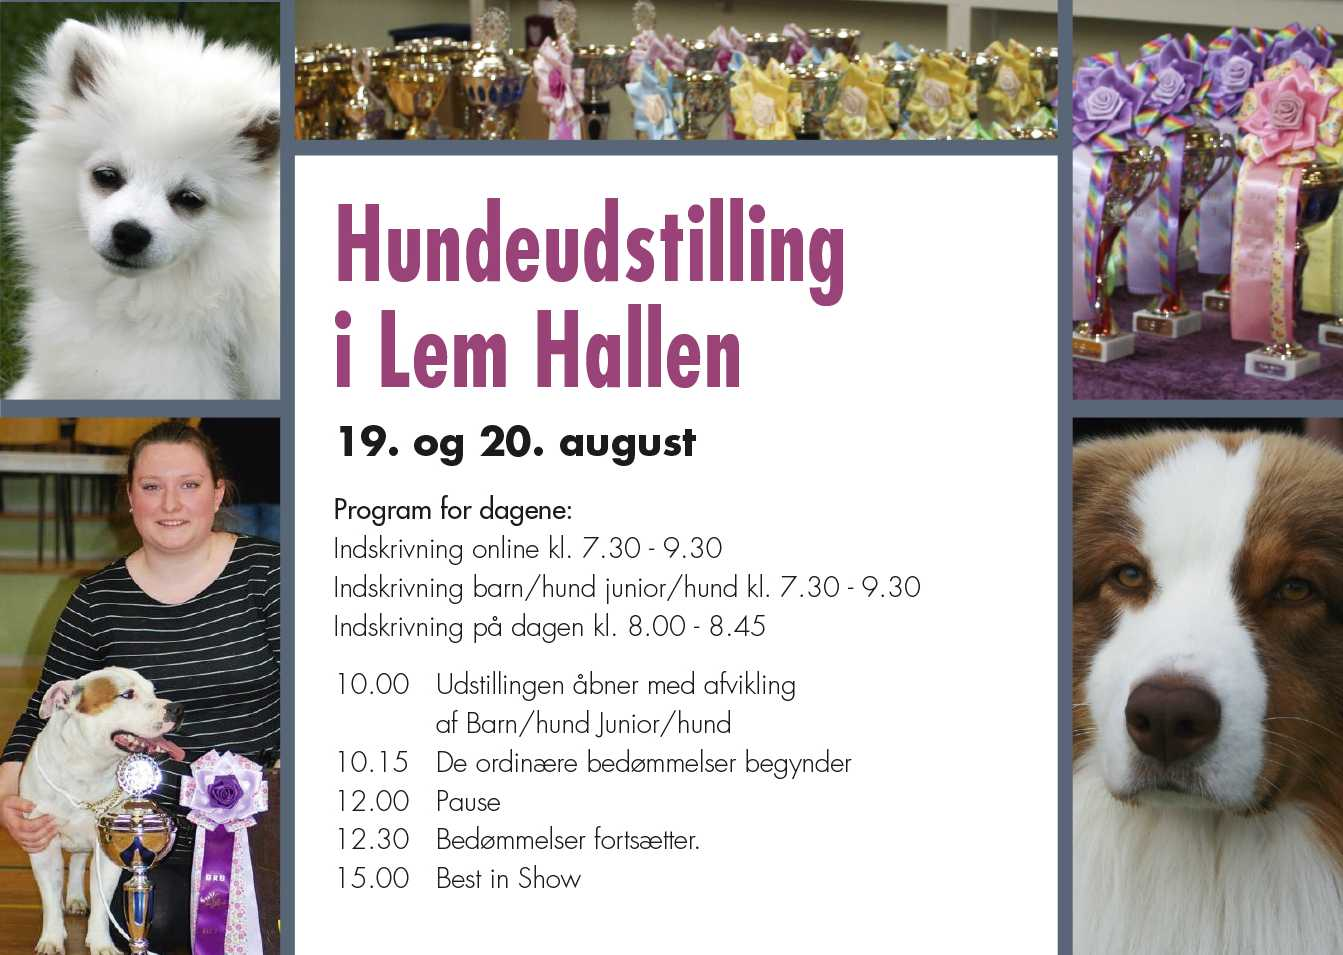 Hundeudstilling i Lem Hallen